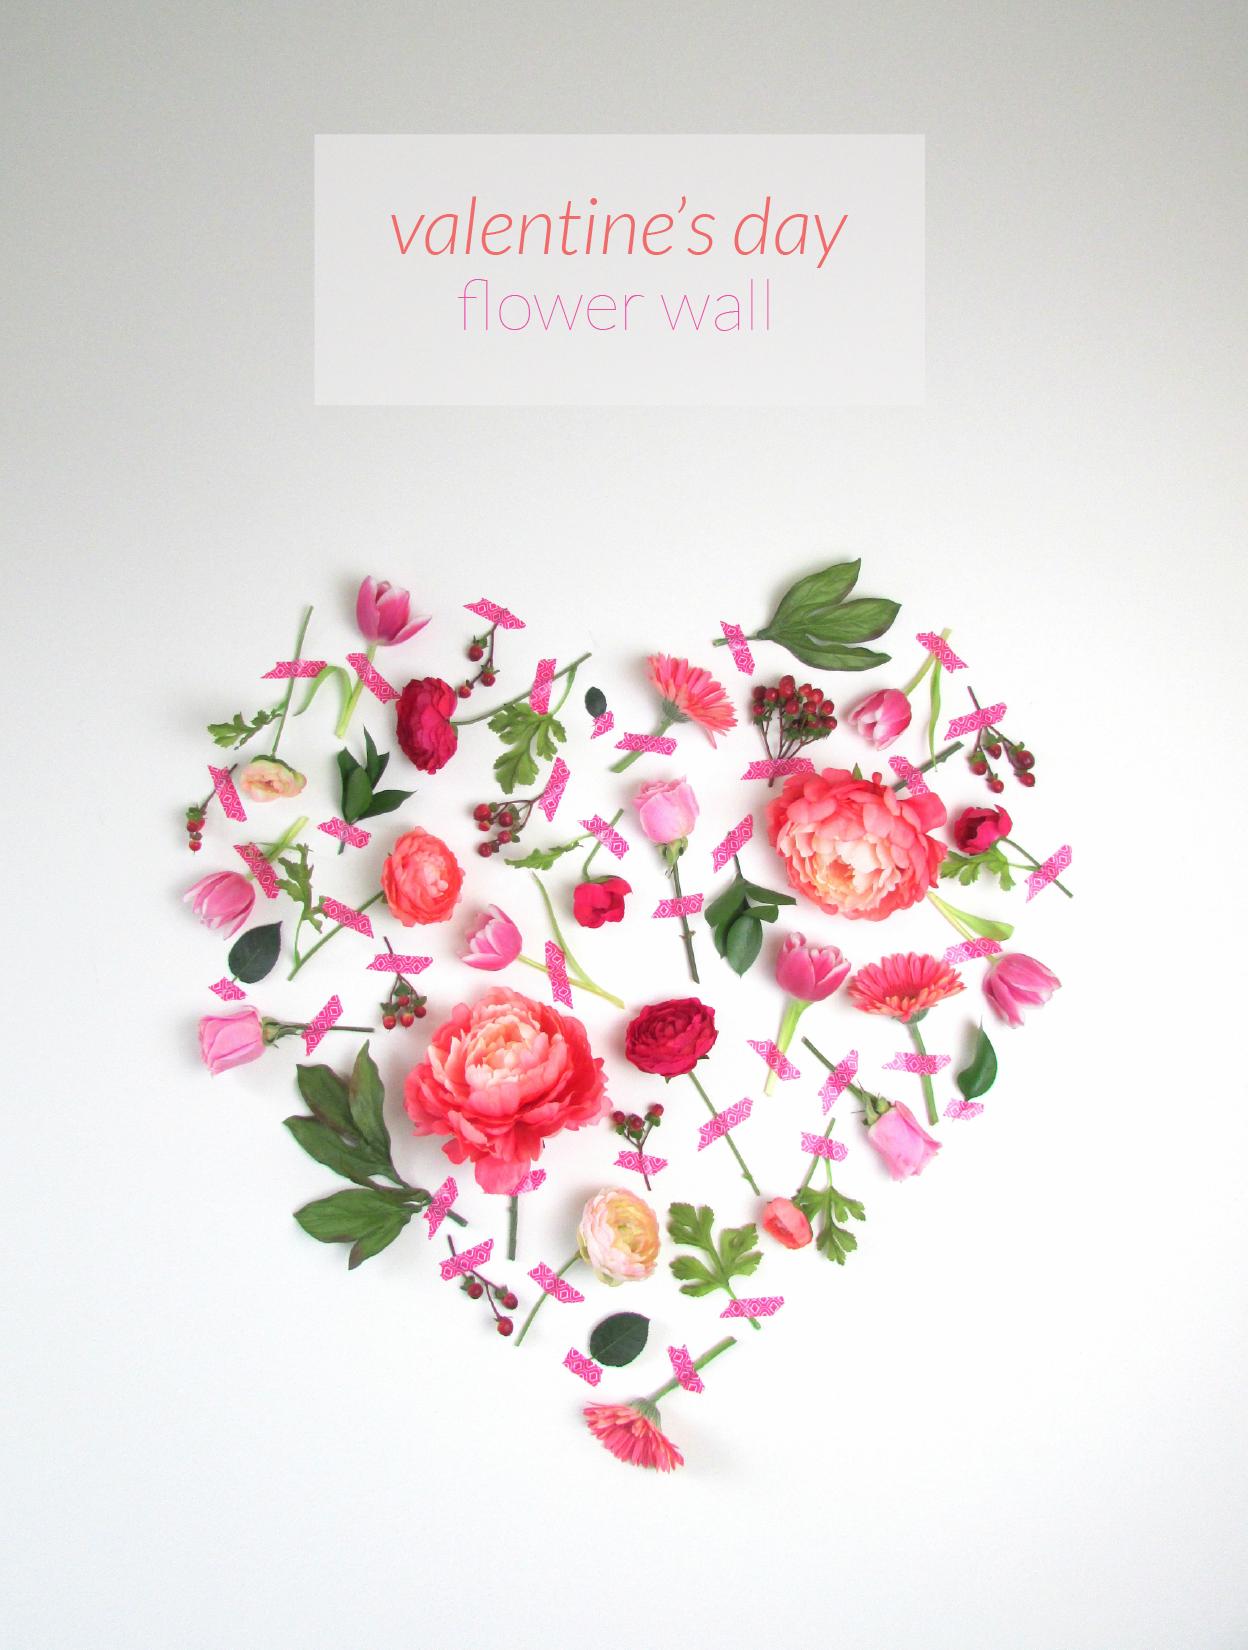 Diy Wall Flowers: Valentine's Day Flower Wall